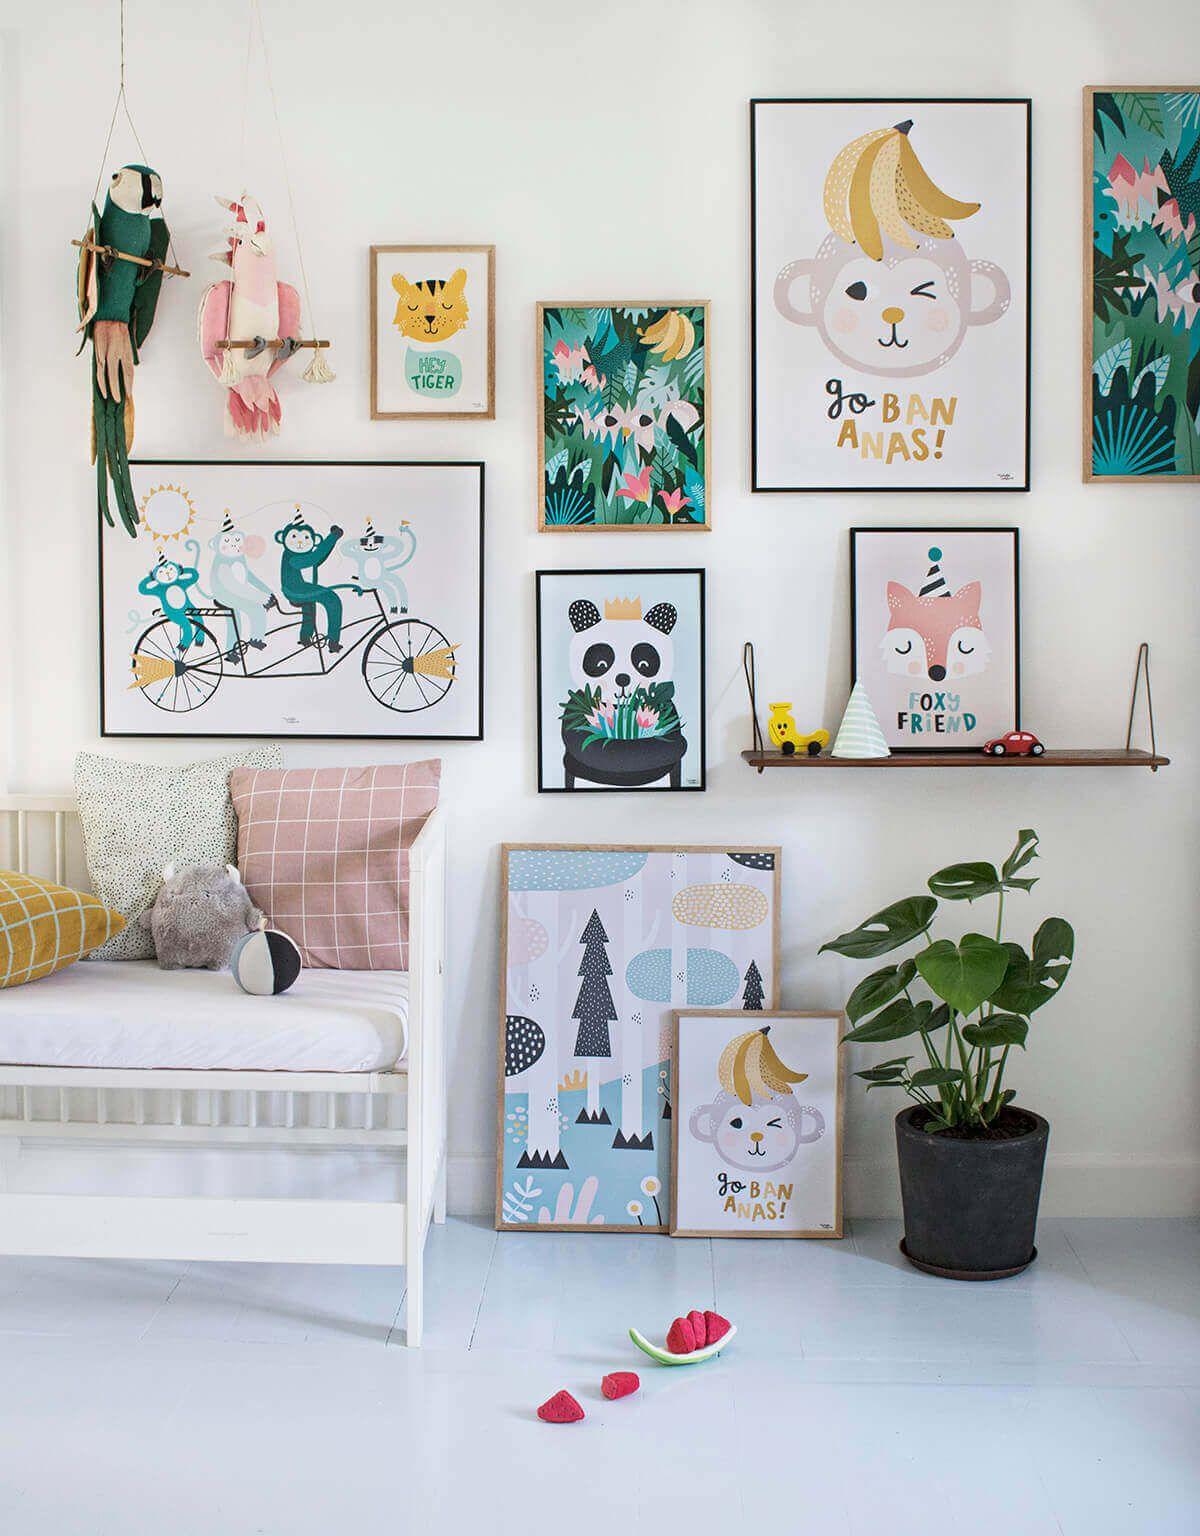 28 Creative Childrens Wall Art Ideas Kids Room Wall Art Kids Bedroom Decor Kids Room Art